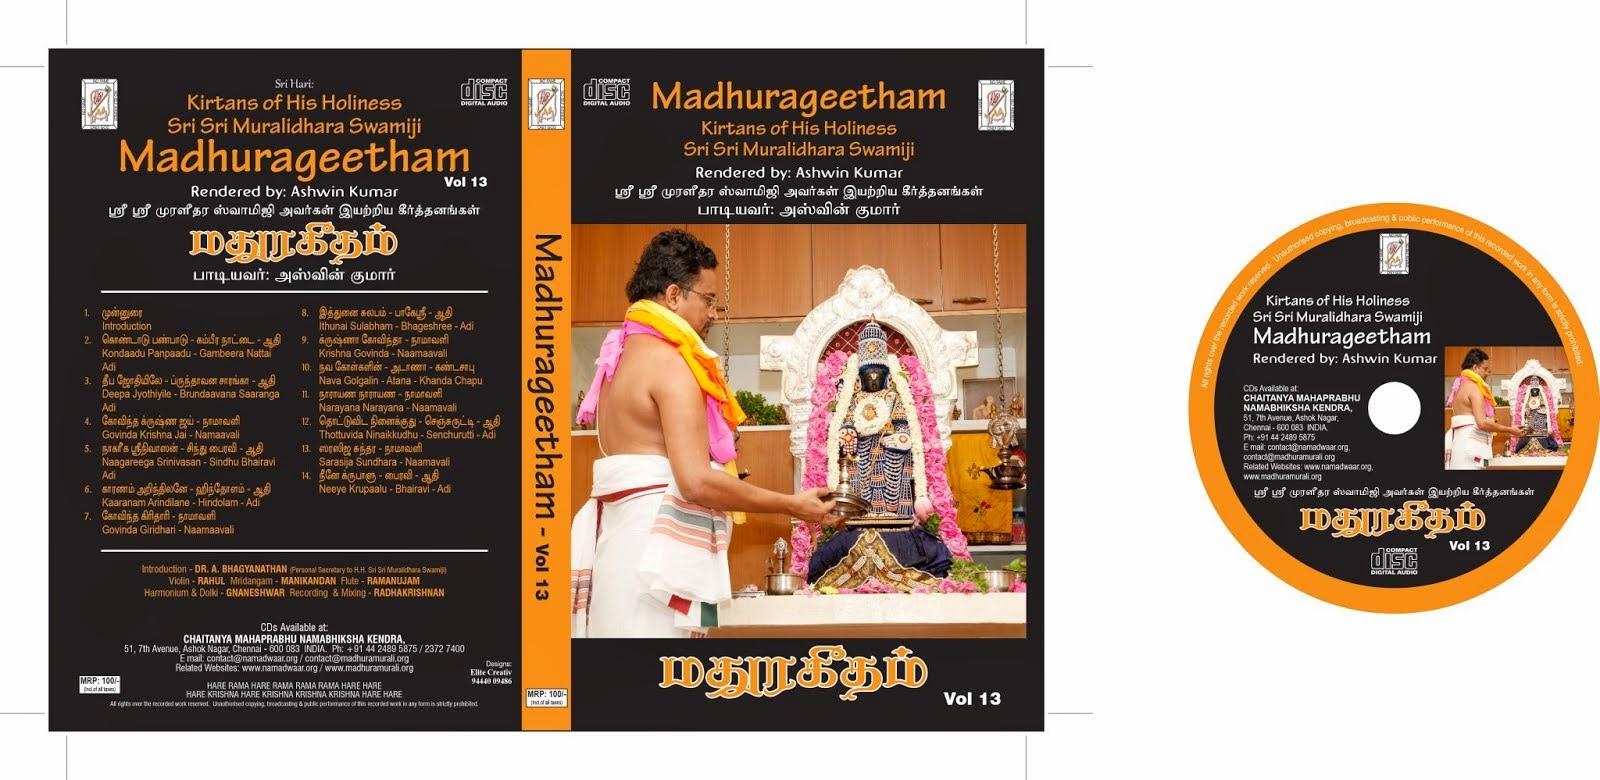 Madhurageetham Vol.13